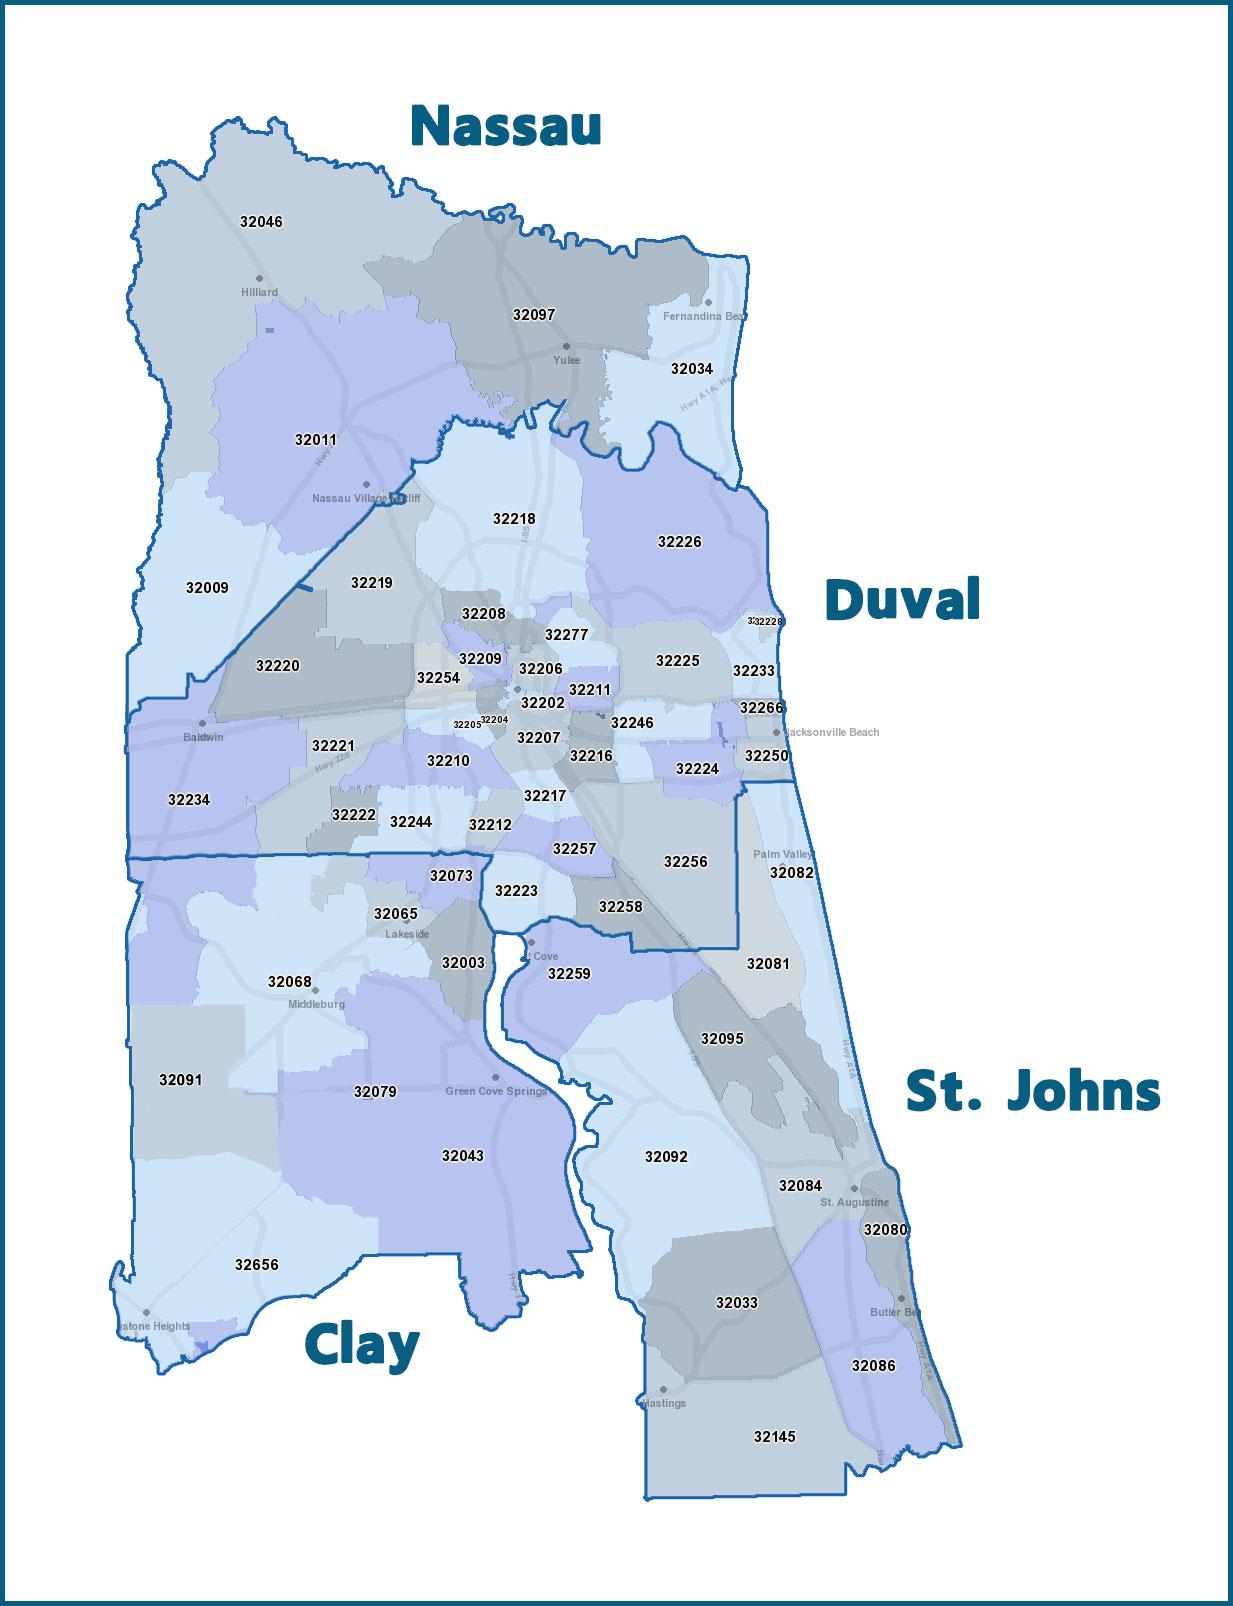 Zip Code Strategy – First Coast United Zip Code Map Of Northeast Florida on map of savannah zip code, map of atlanta zip code, map of long island zip code, map of broward zip code, map of memphis zip code, map of new orleans zip code, map of jacksonville zip code, map of phoenix zip code, map of gainesville zip code, map of detroit zip code, map of seattle zip code, map of orlando zip code, map of upstate new york zip code, map of austin zip code,